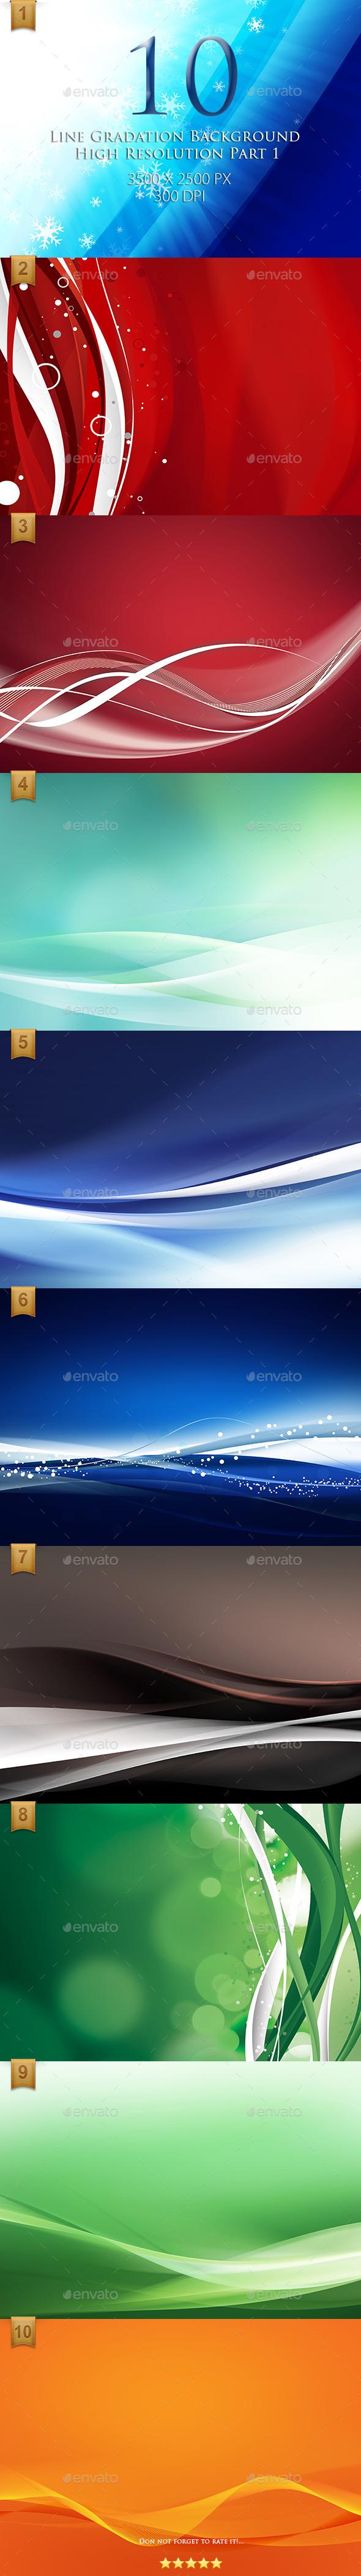 GraphicRiver 10 Line Gradation Background High Resolution 9642344